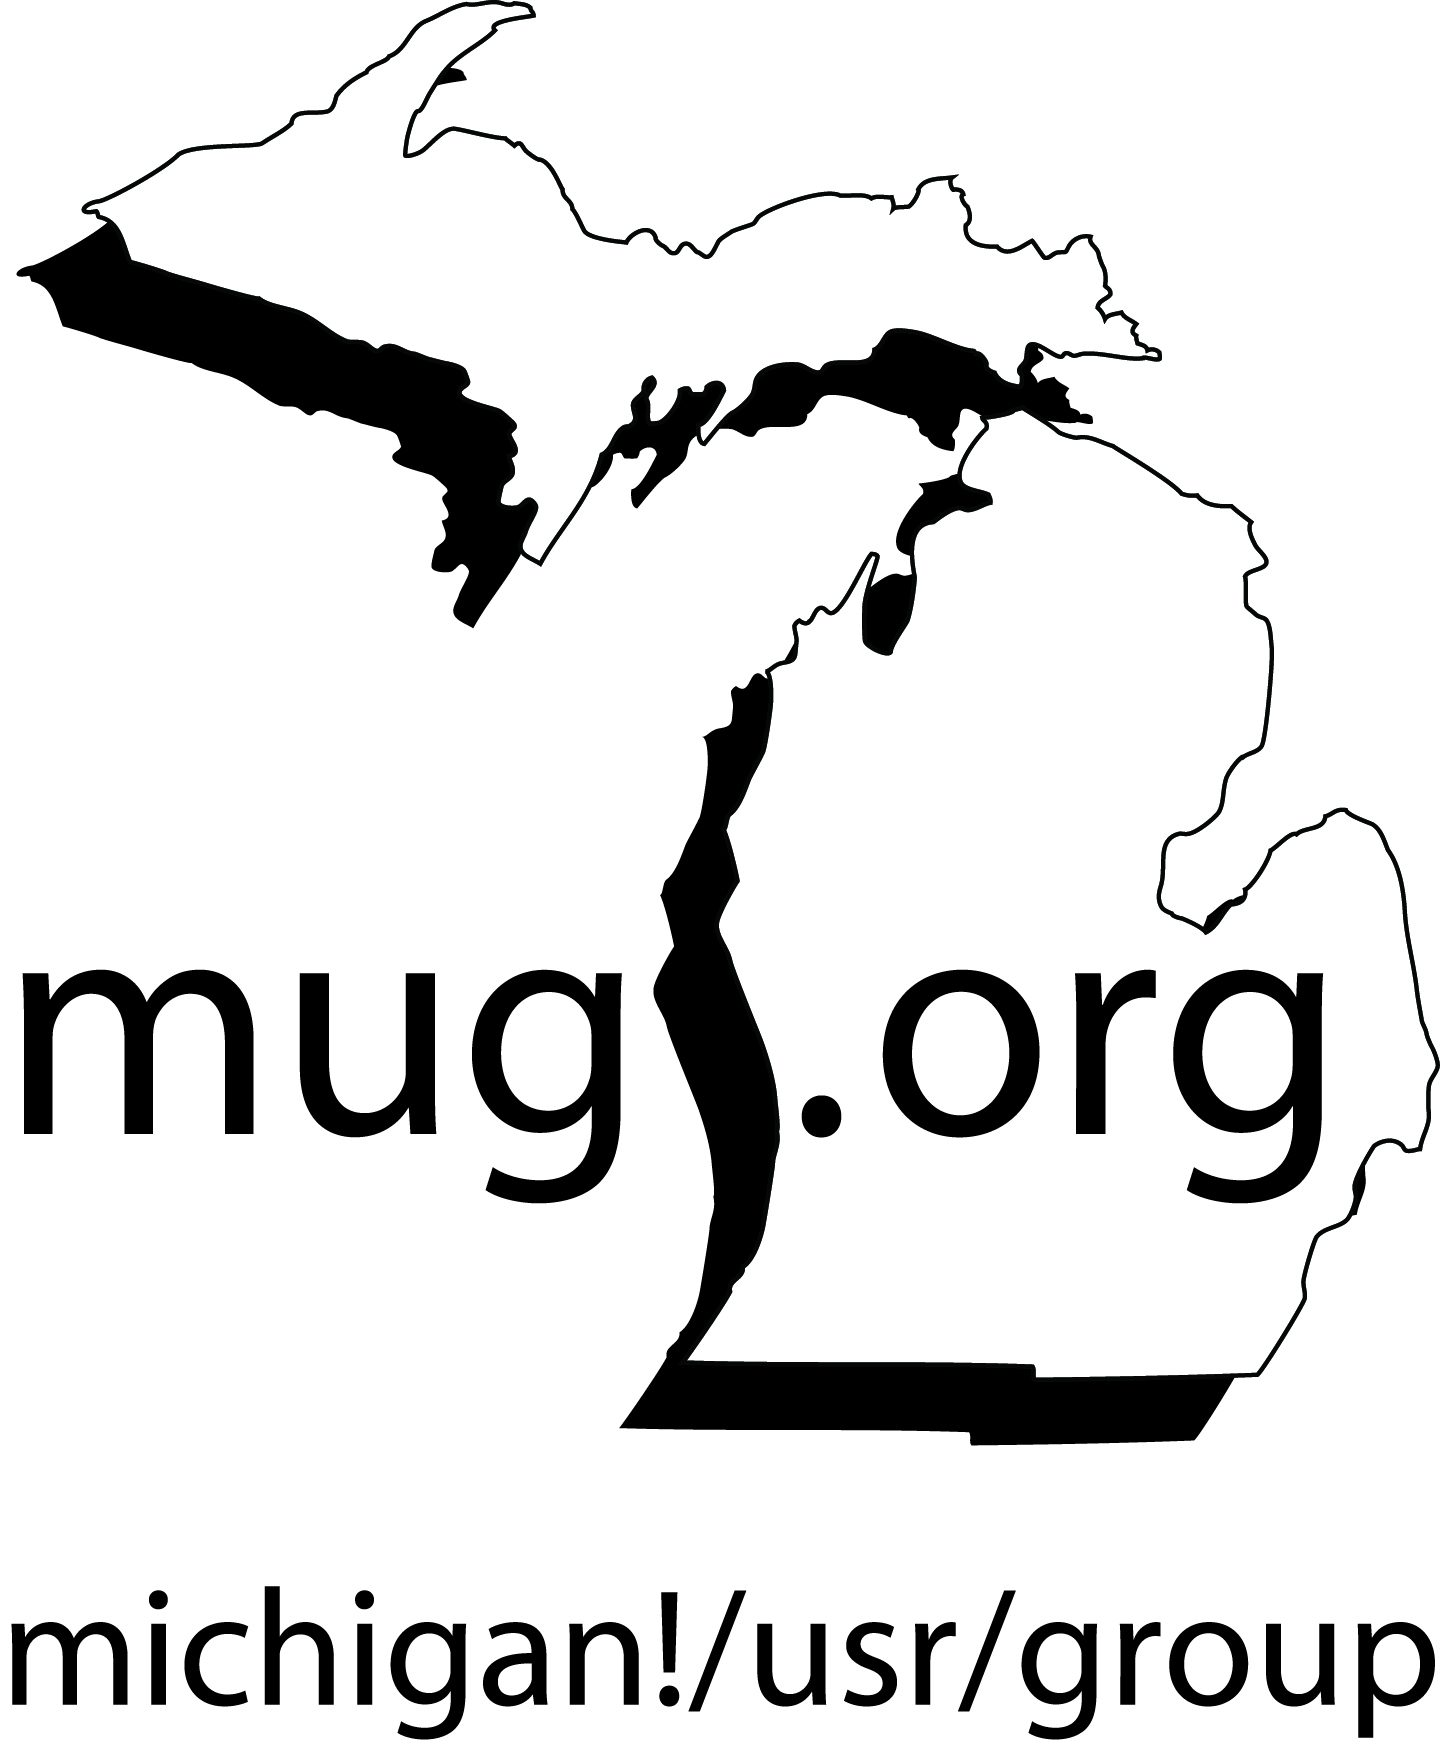 Michigan!/usr/group